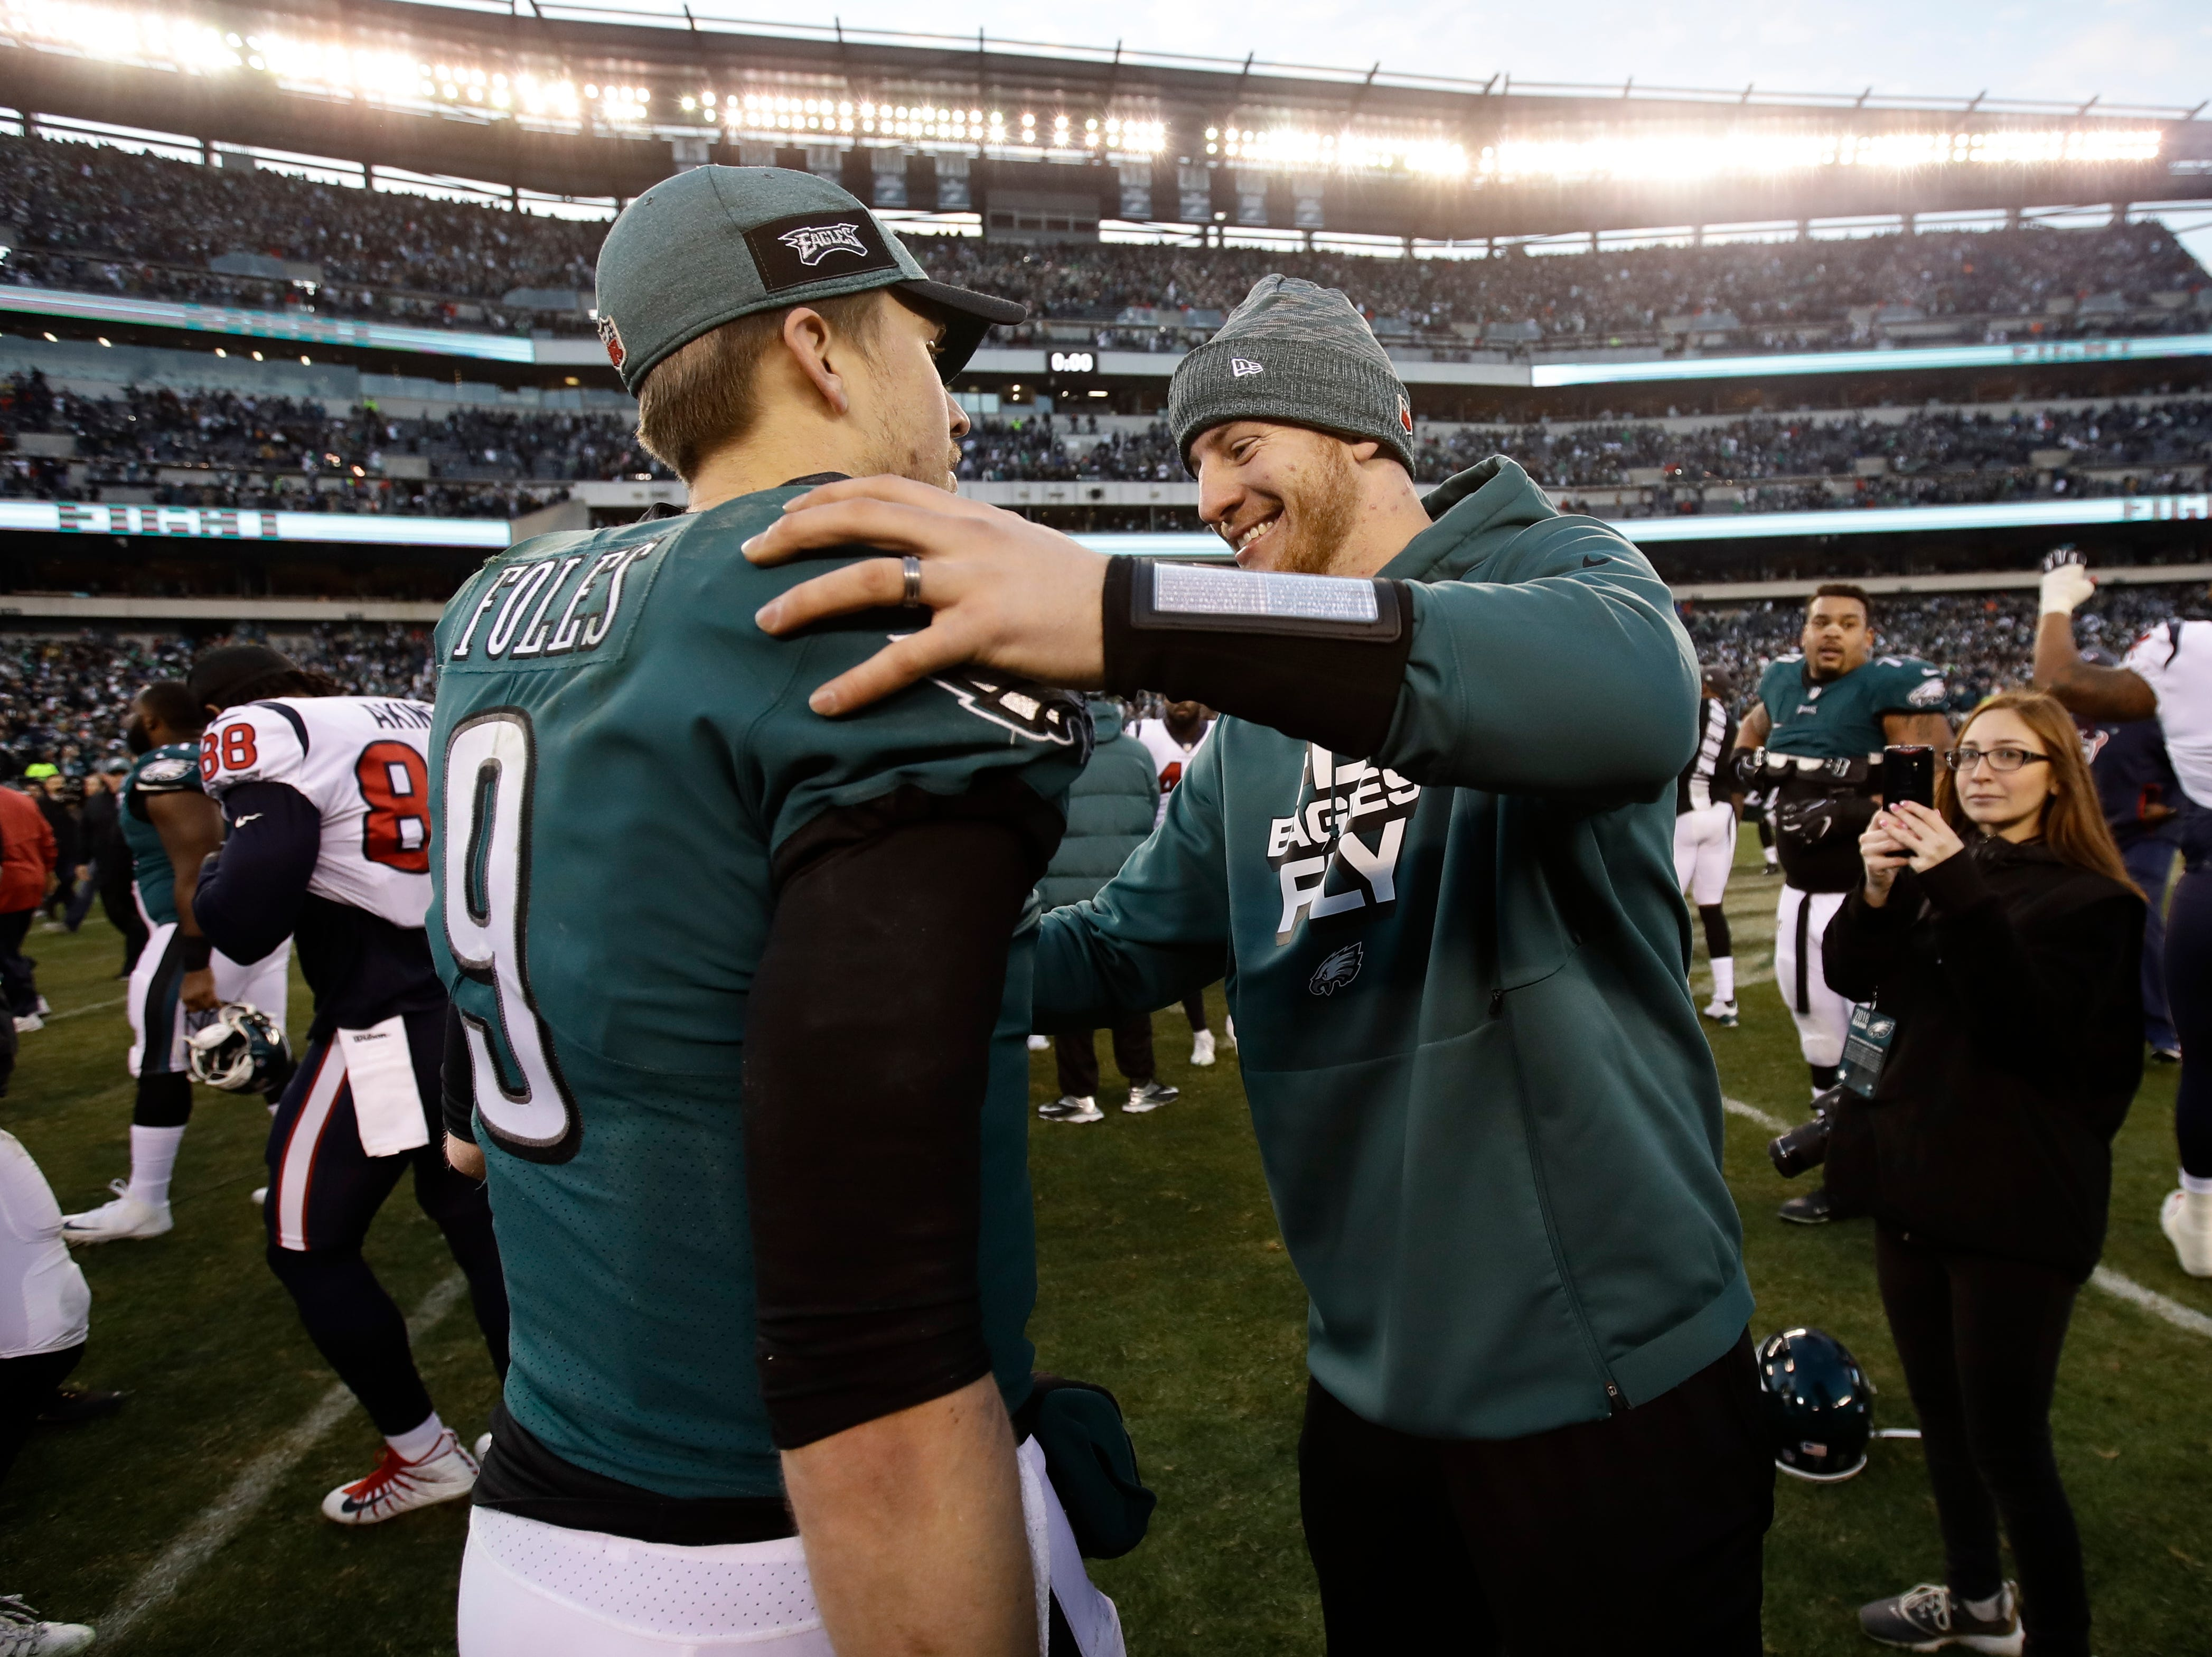 Philadelphia Eagles' Nick Foles, left, and Carson Wentz celebrate after an NFL football game against the Houston Texans, Sunday, Dec. 23, 2018, in Philadelphia. Philadelphia won 32-30. (AP Photo/Matt Rourke)